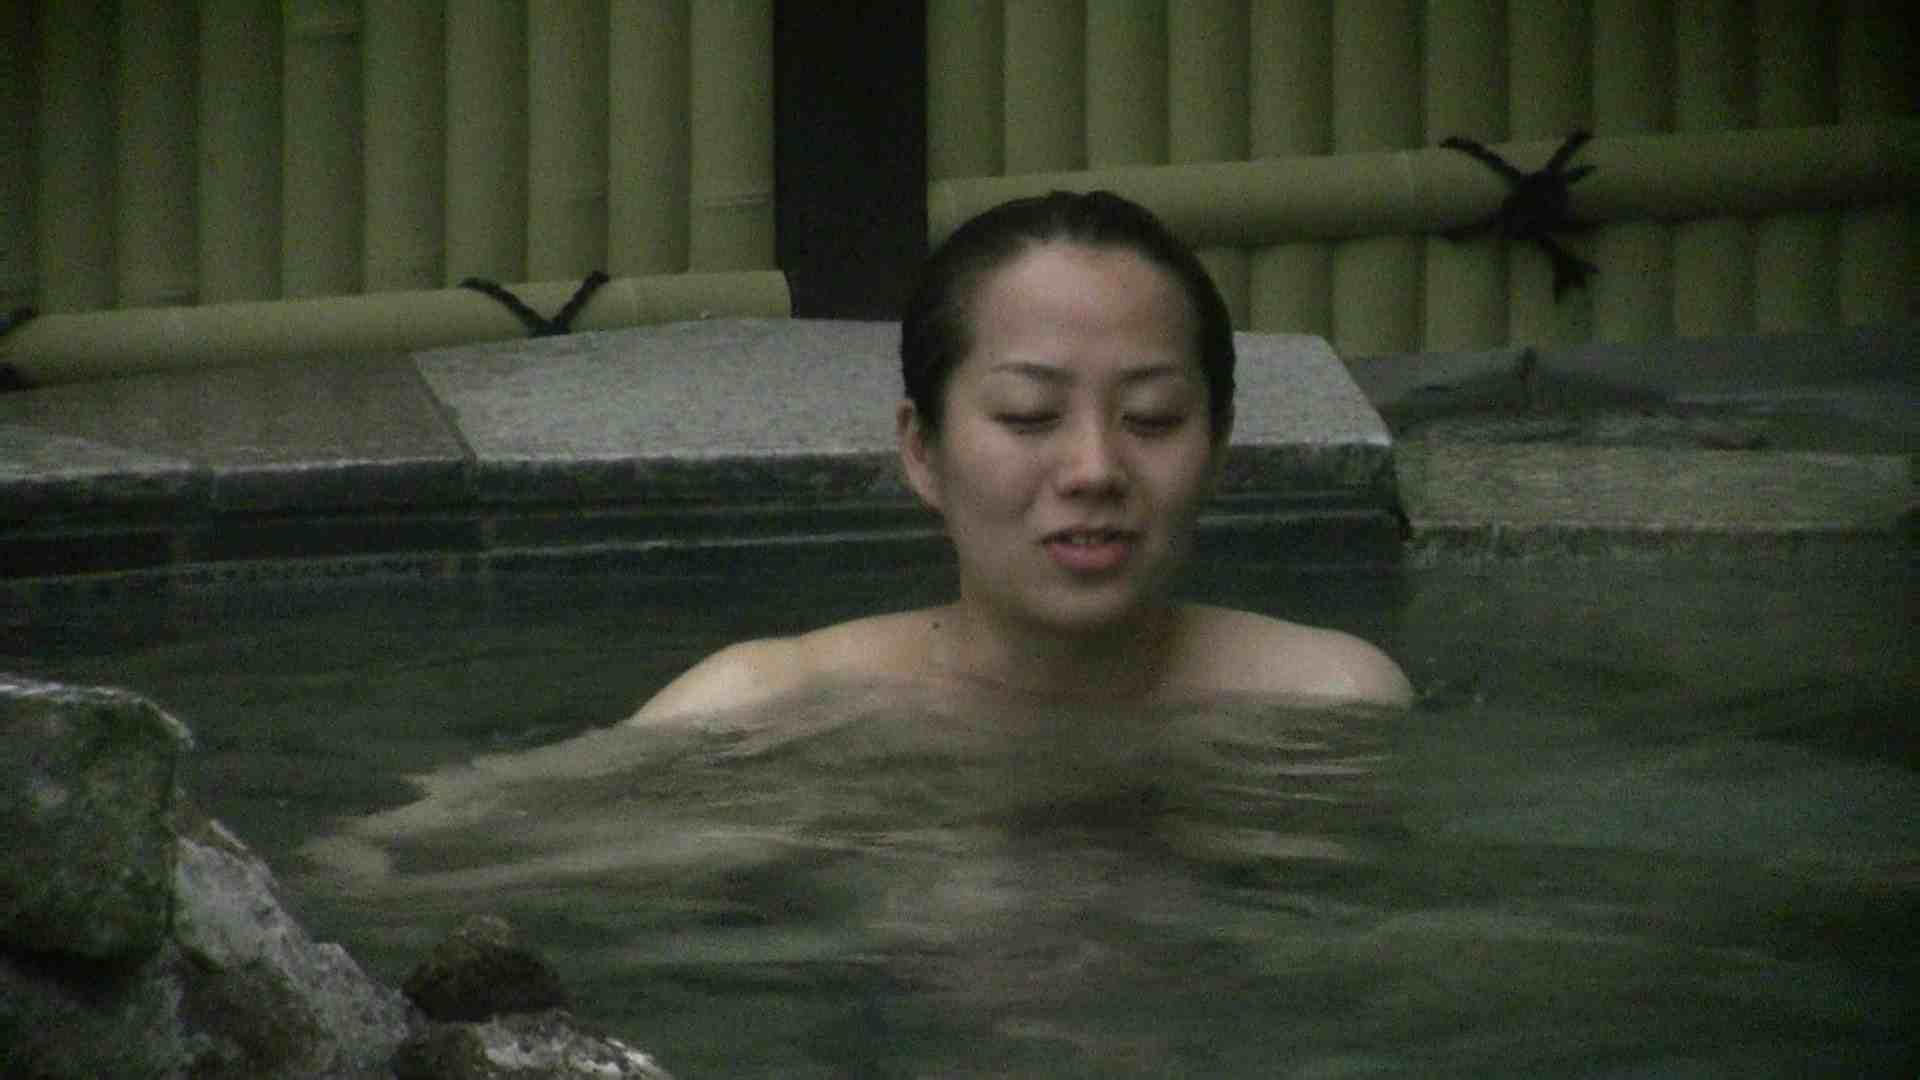 Aquaな露天風呂Vol.539 OL女体 | 露天  88連発 73